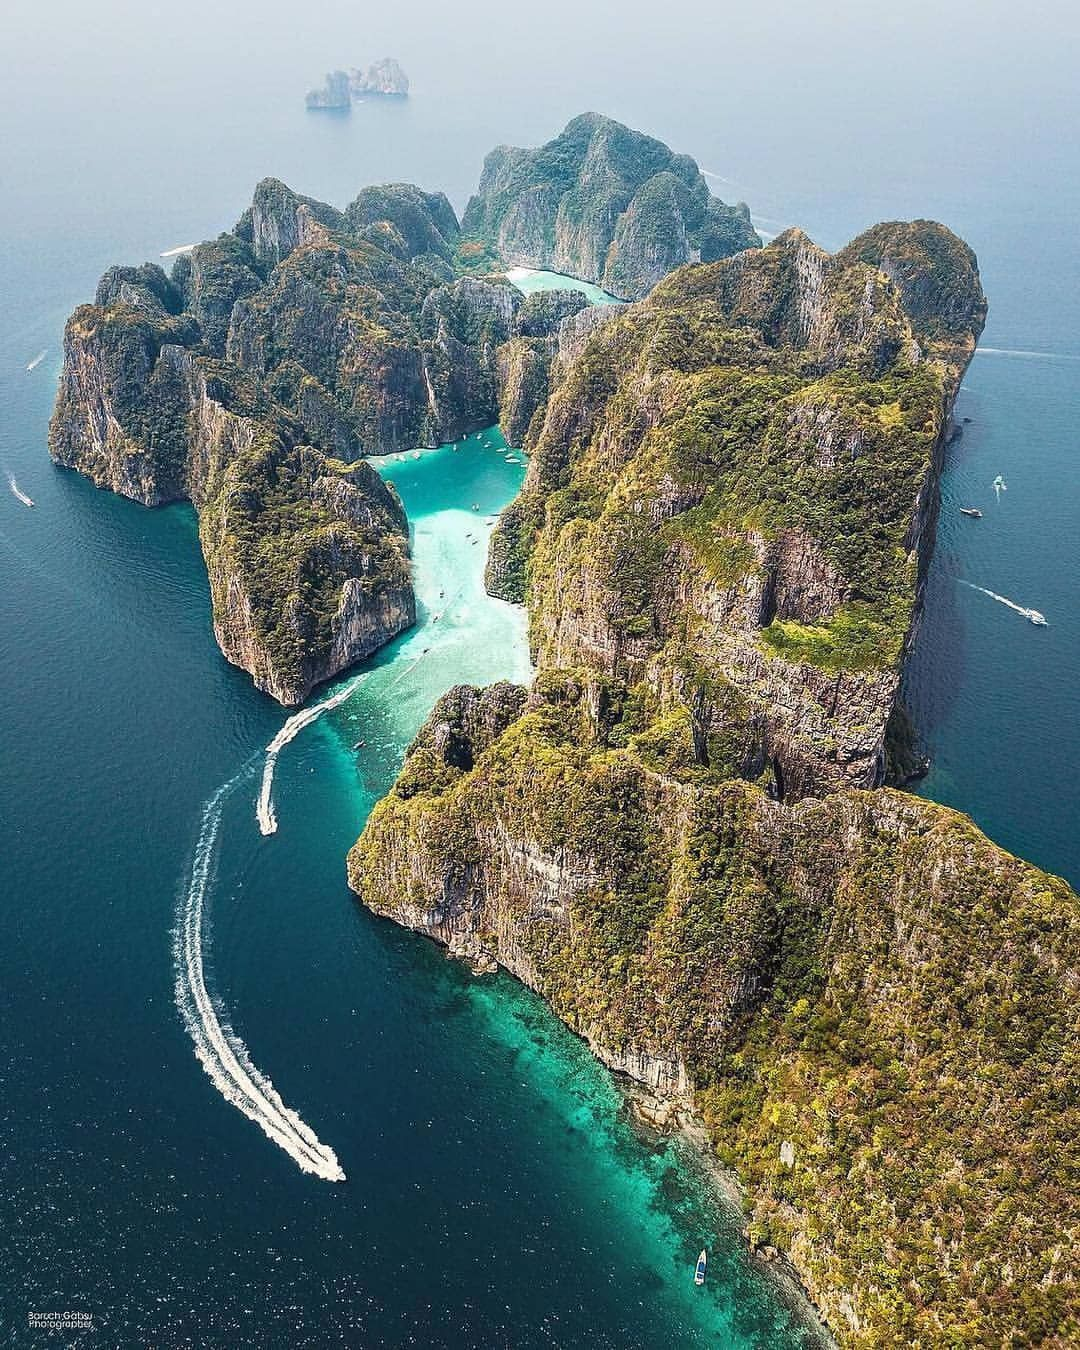 🌴 Phi Phi Leh Island, Thailand. Photo by @baruch_gabsu ➖➖➖➖➖➖➖➖➖➖➖➖➖➖ #explorer #explore #discover #wanderlust #travel #travelbug…